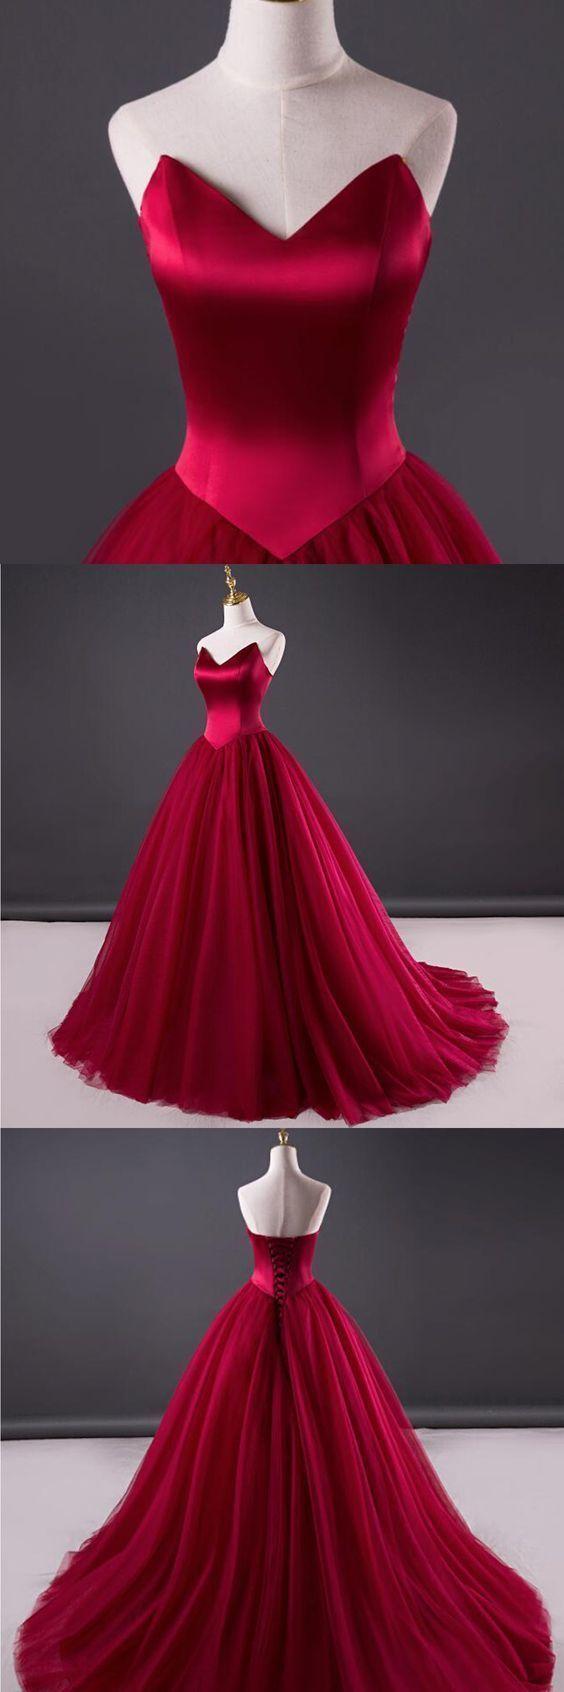 Charming Sweetheart A-Line Prom Dresses,Long Prom Dresses,Cheap Prom Dresses, Evening Dress Prom Gowns, Formal Women Dress,Prom Dress,112601 by Dress Storm, $169.00 USD #eveningdresses